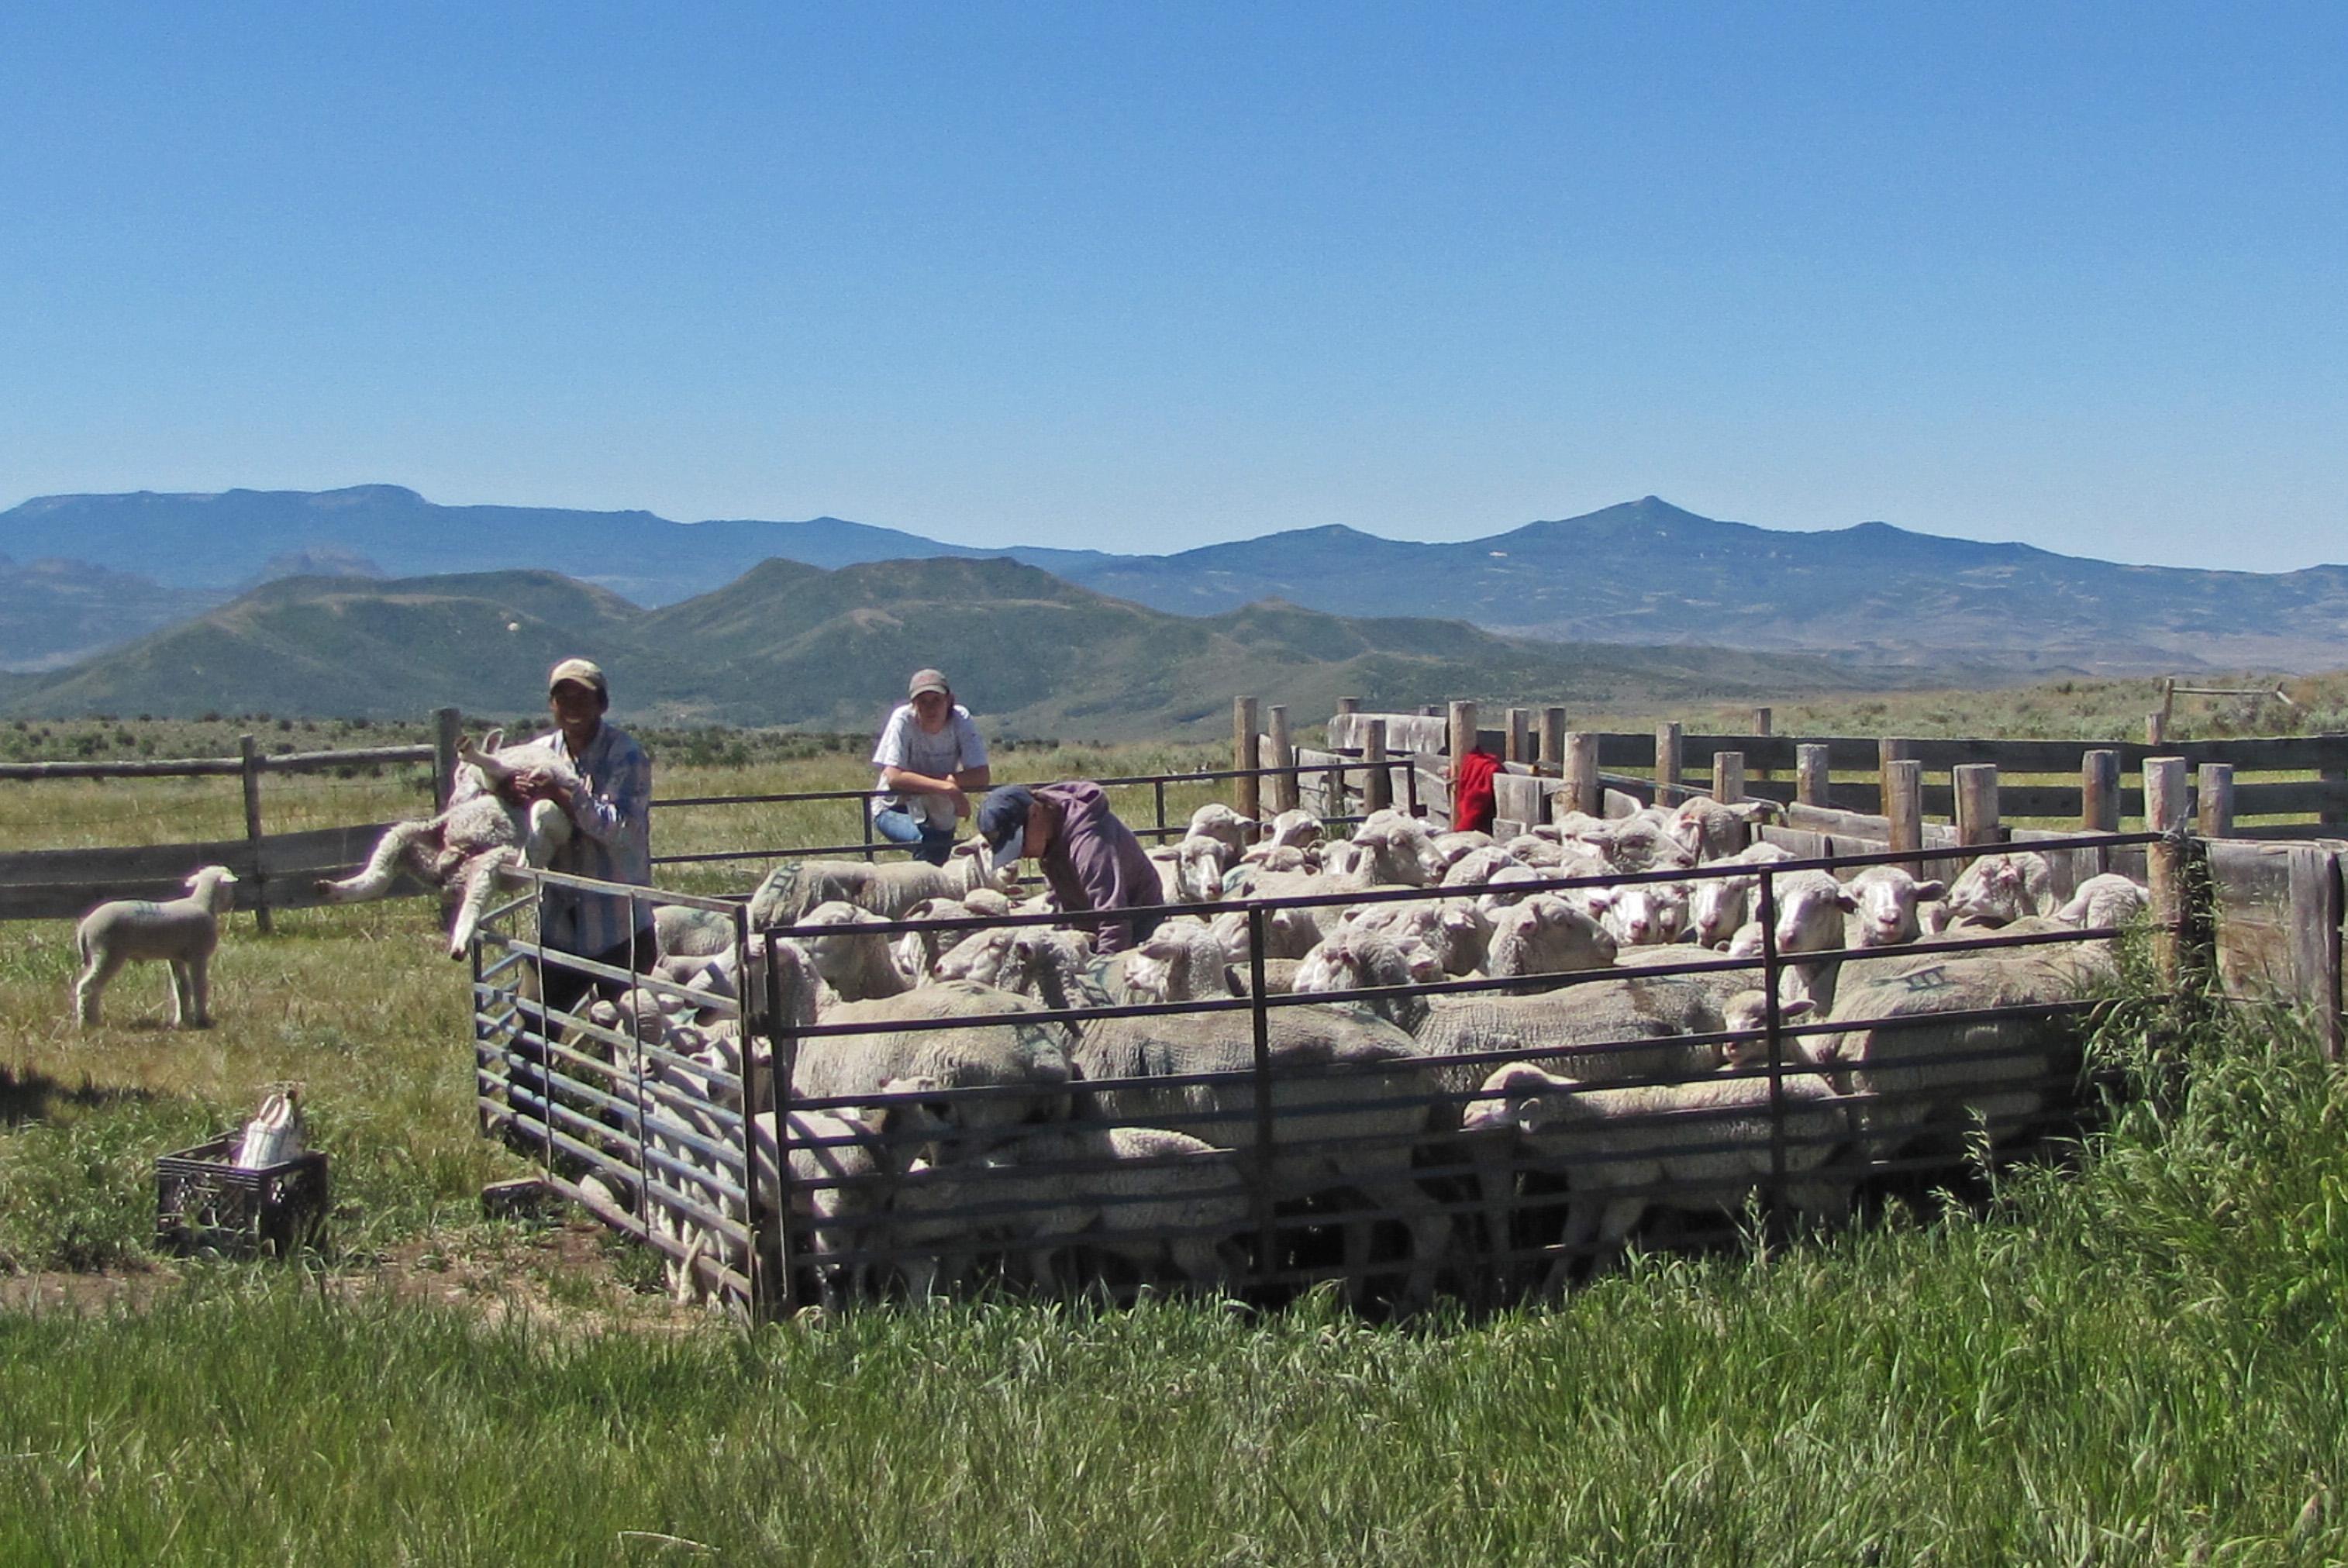 Stumbling Upon a Sheep Corral | LivOnAMission